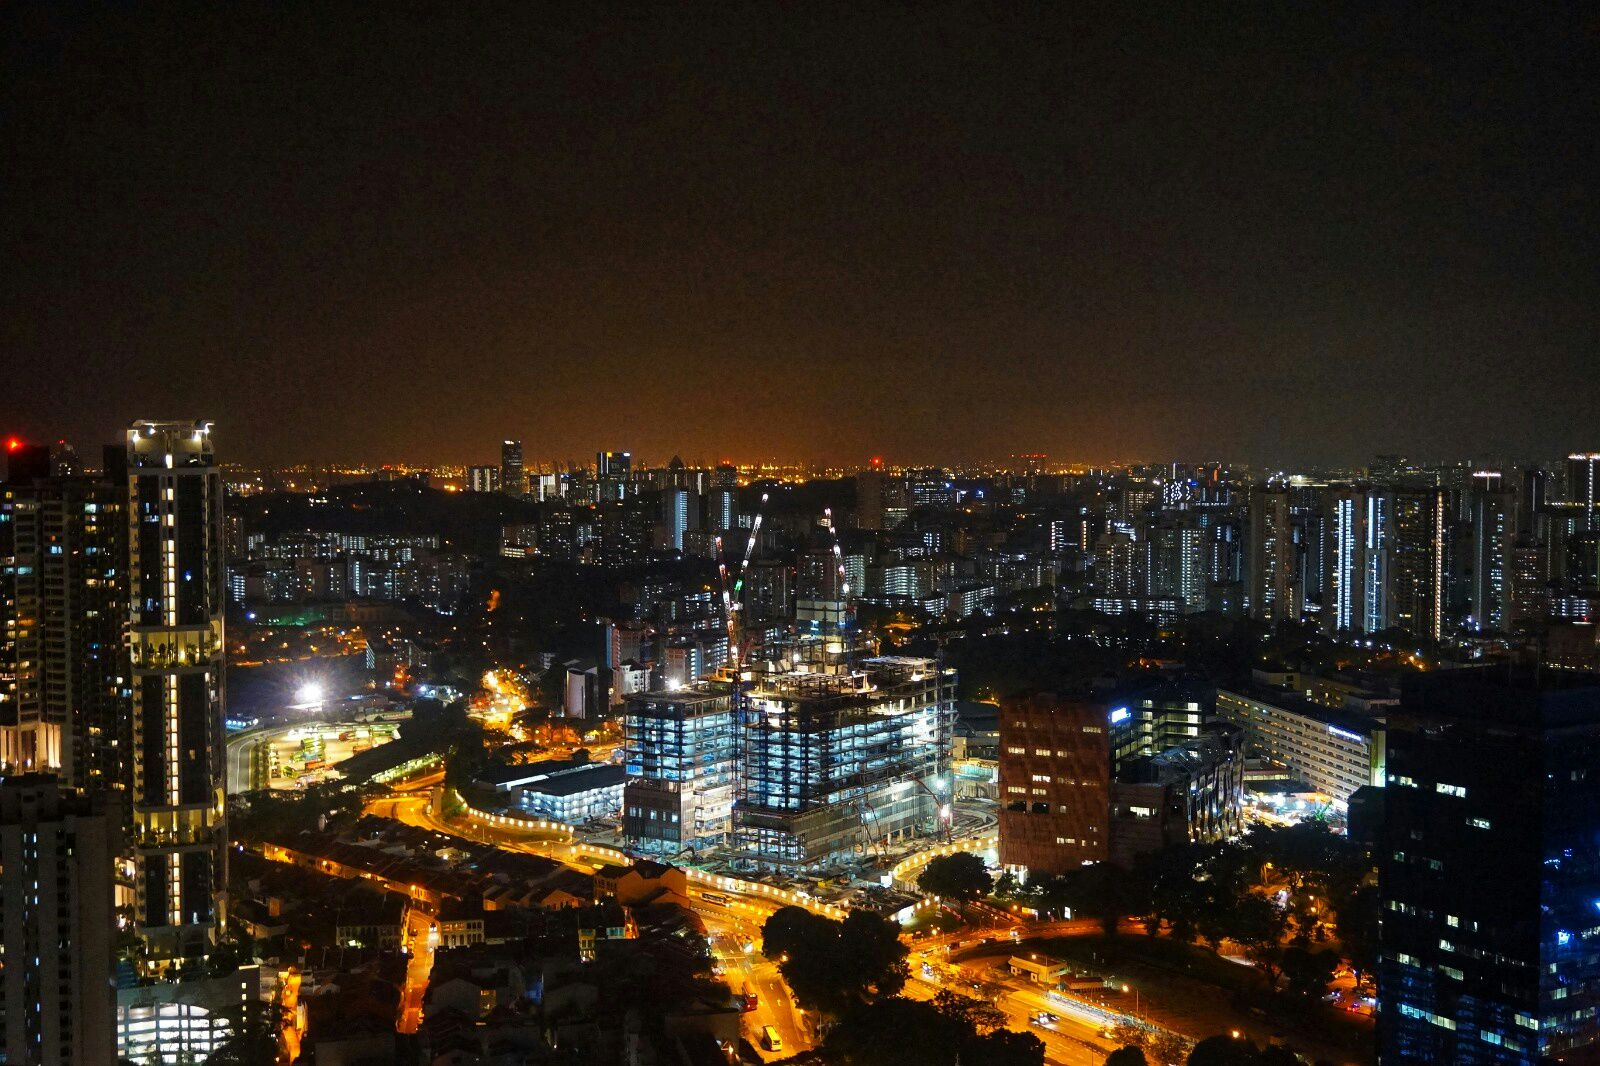 Tours in Singapore at night